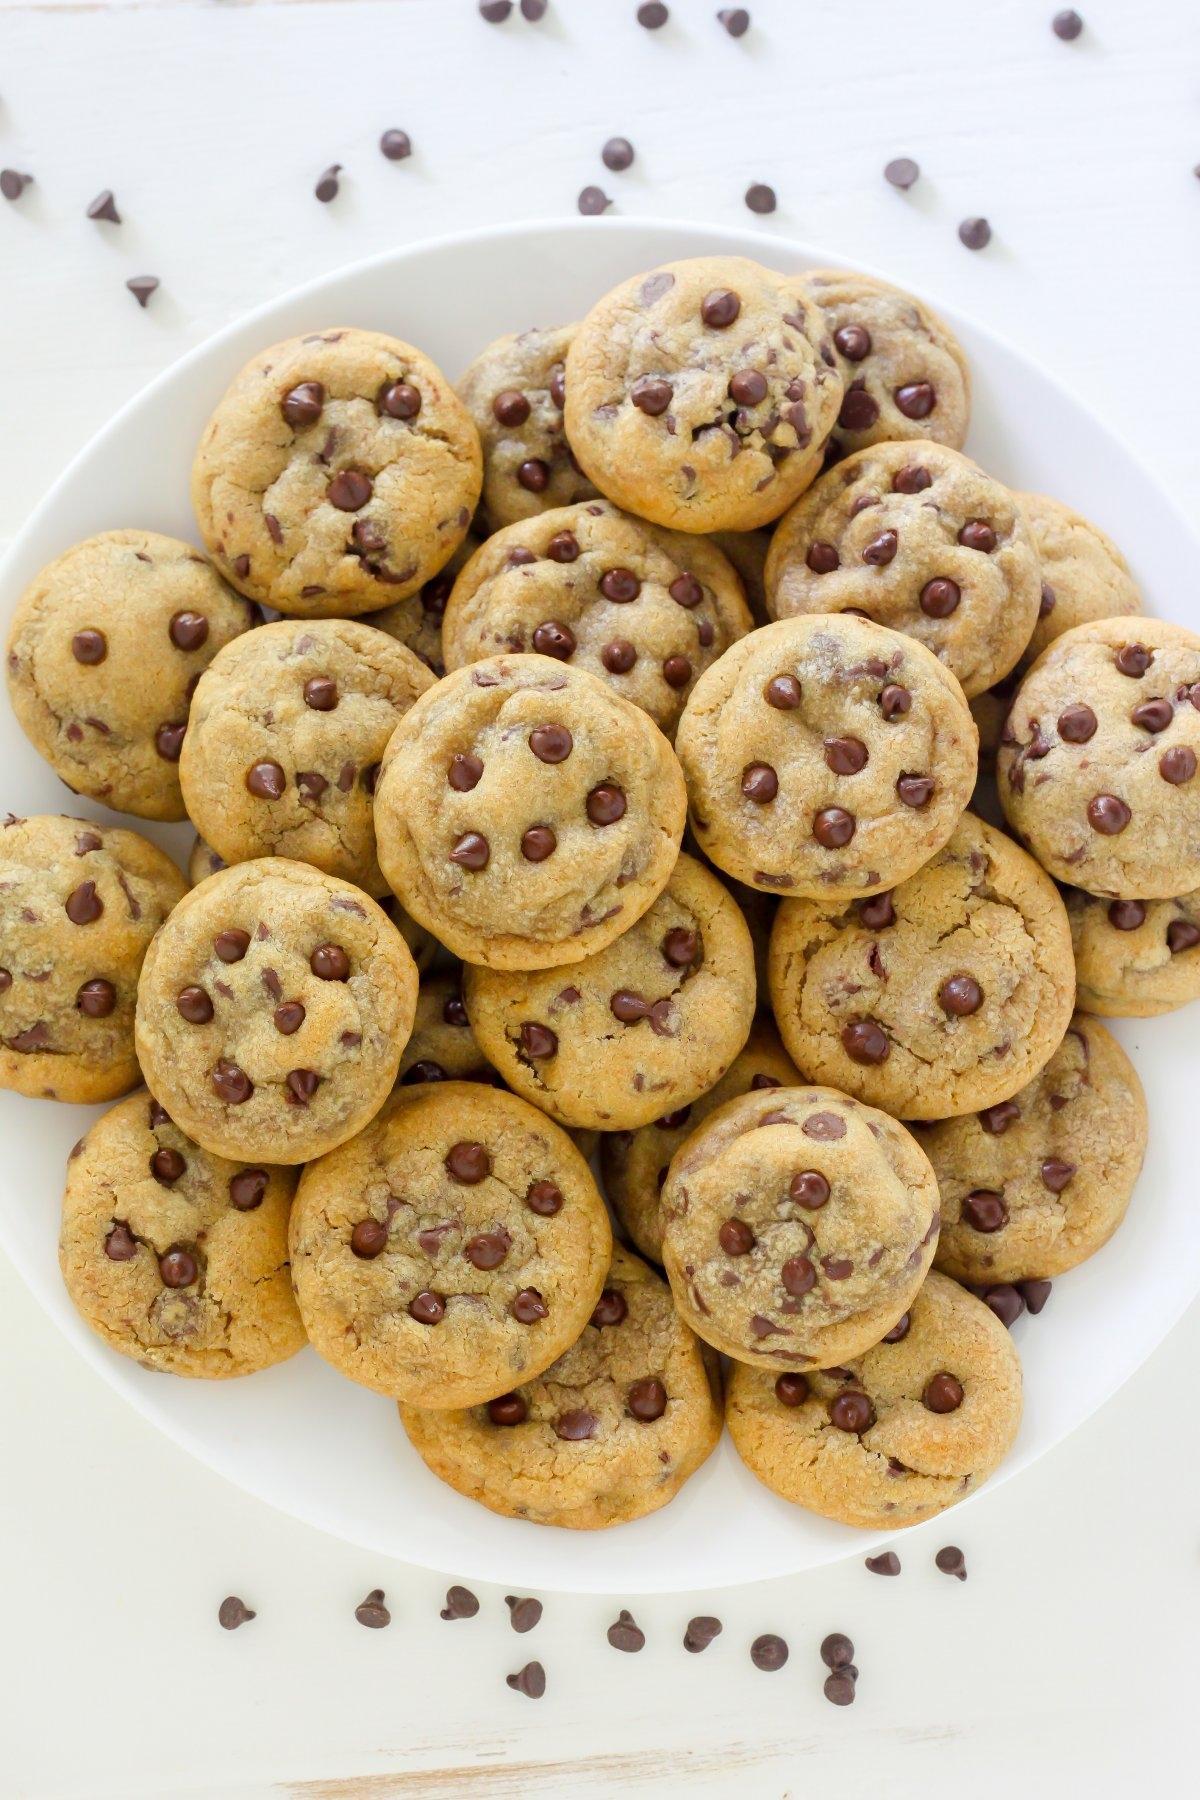 christmas gifts for acquaintances: Homemade Cookies